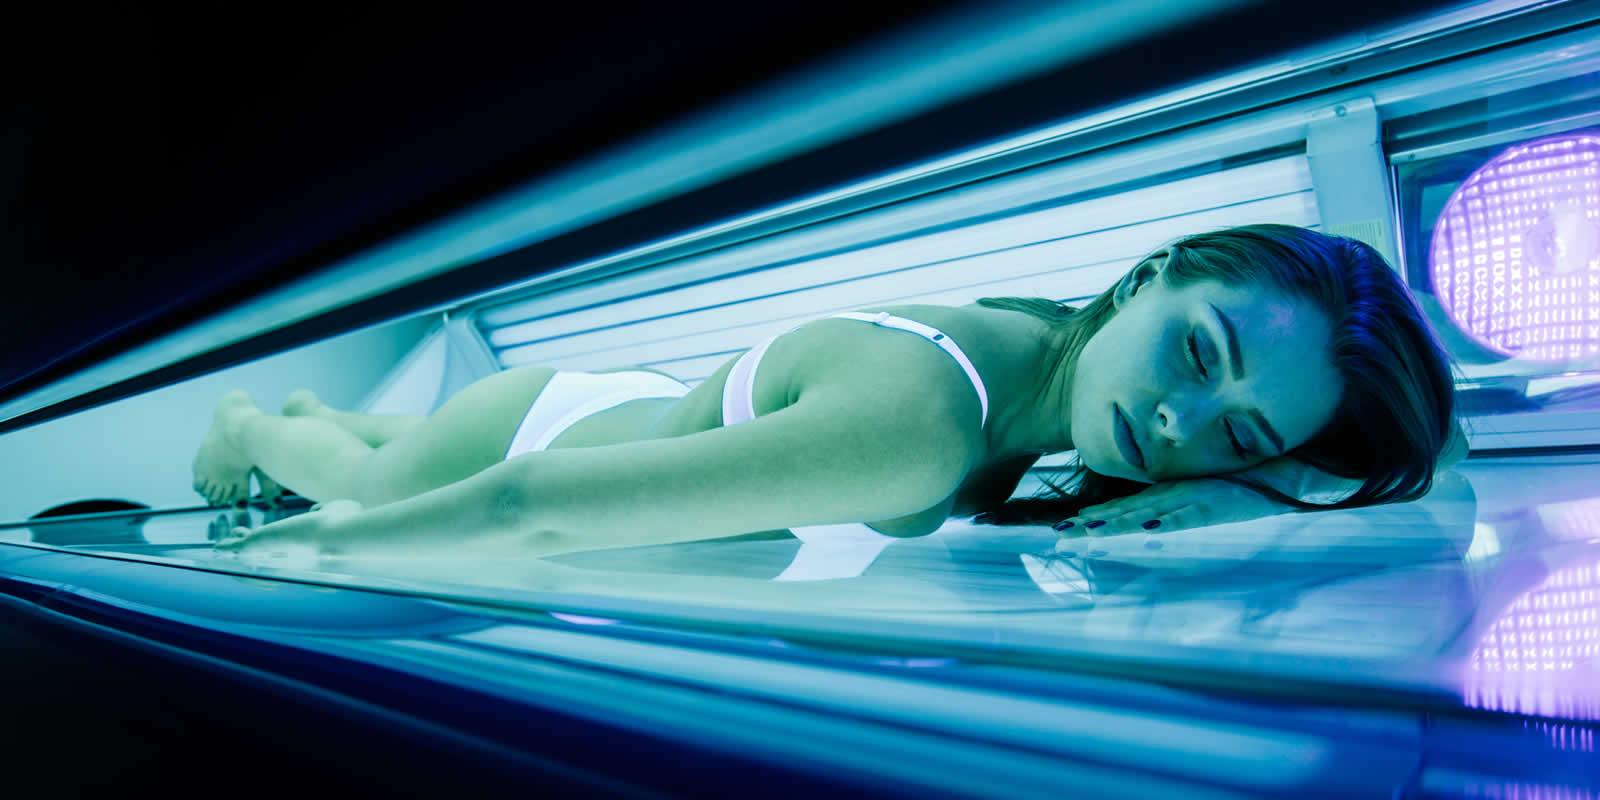 Solarium vor dem Urlaub sinnvoll?